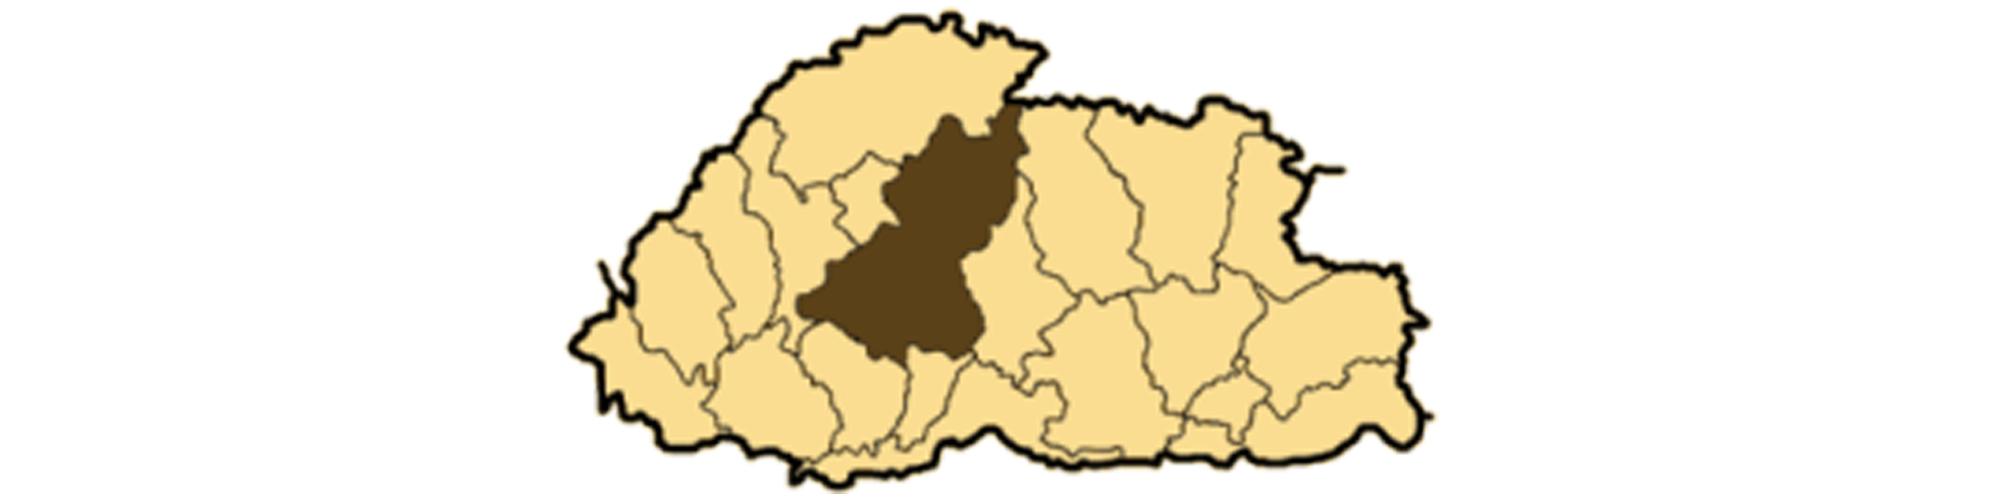 Wangduephodrang